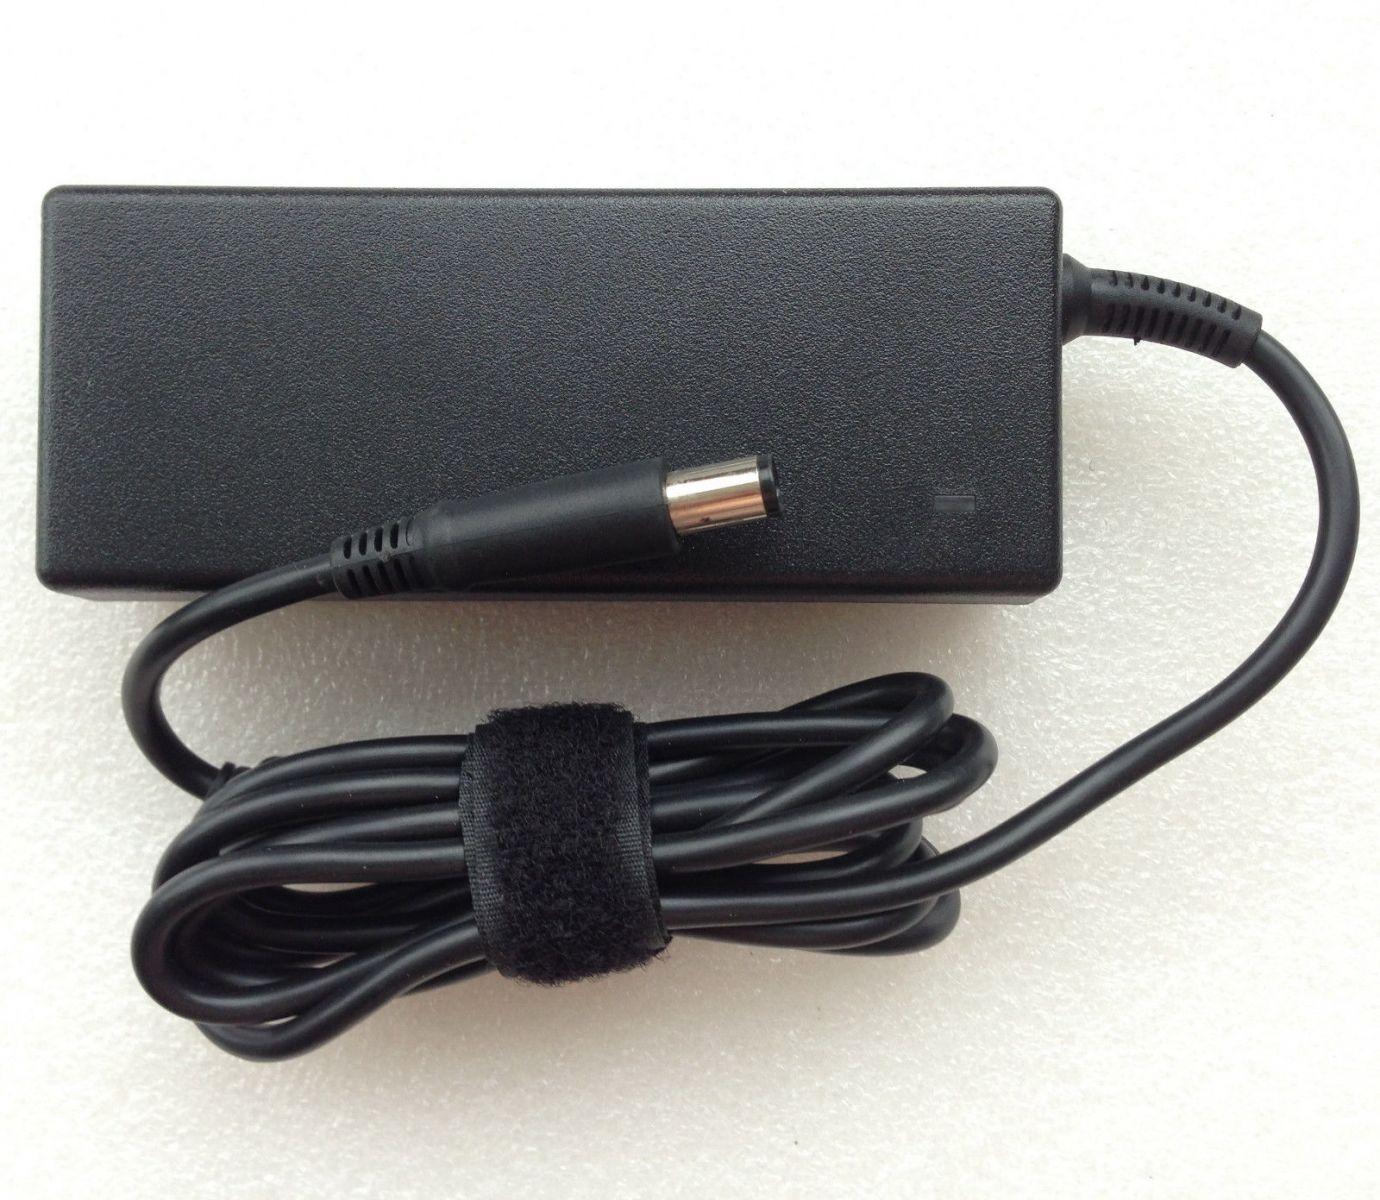 Sạc cho laptop Dell Latitude E7240, Latitude E7440 Adapter 19.5V-3.34A, 19.5V-4.62A